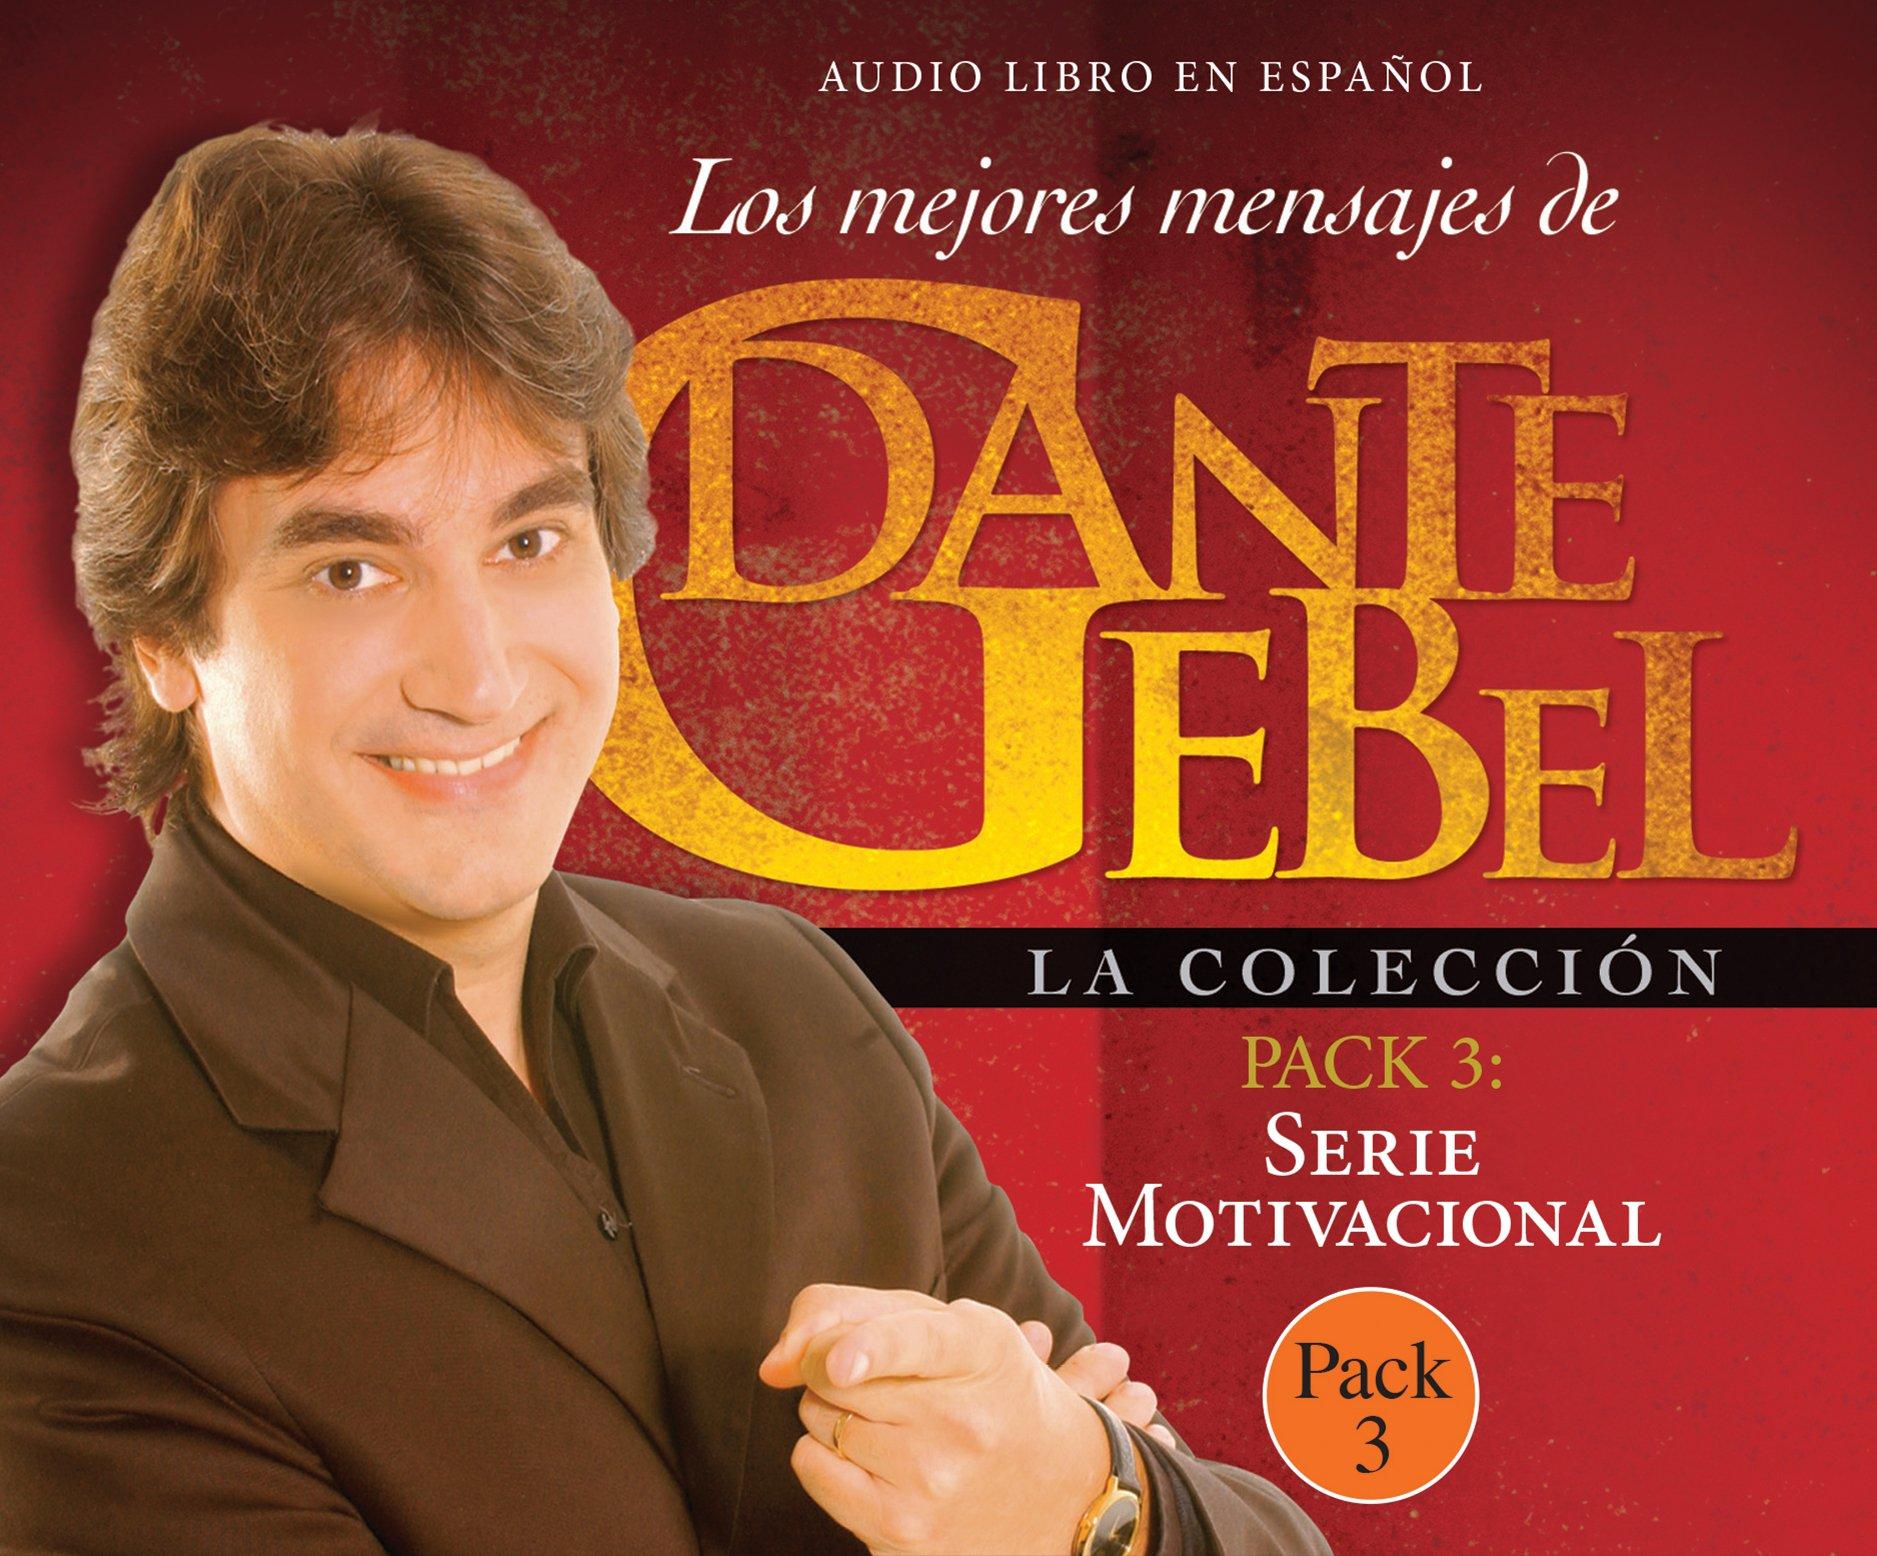 Serie Motivacional Motivational Series Spanish Edition